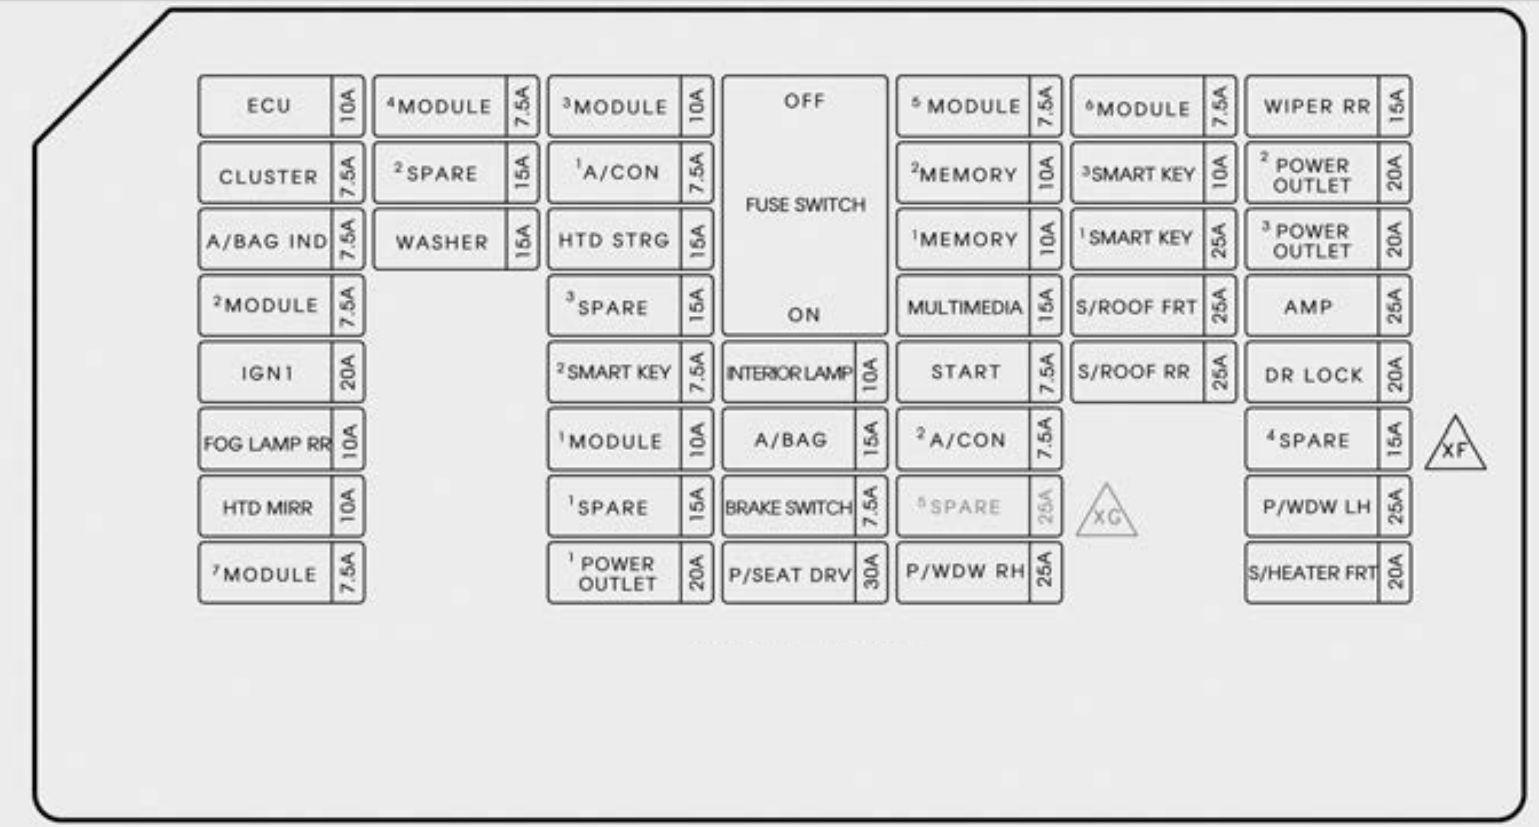 Kia Fuse Diagram - Lir Wiring 101 Kia Fuse Box Diagram on 01 kia sportage fuse diagram, kia power steering pump diagram, kia sedona 2004 diagram, 2009 kia spectra fuse diagram, 2007 kia sorento fuse panel diagram, kia sedona fuse box, kia transmission diagram, kia fuse box 1999, kia optima radio harness diagram, 1997 kia sephia fuse diagram, kia spectra5 fuse box location, kia engine diagram, kia optima fuse diagram, kia tie rod diagram, kia wiring diagram, kia soul wire diagrams, kia serpentine belt diagram, kia soul fuse diagram, kia sedona fuse panel diagram, kia spectra fuse box,